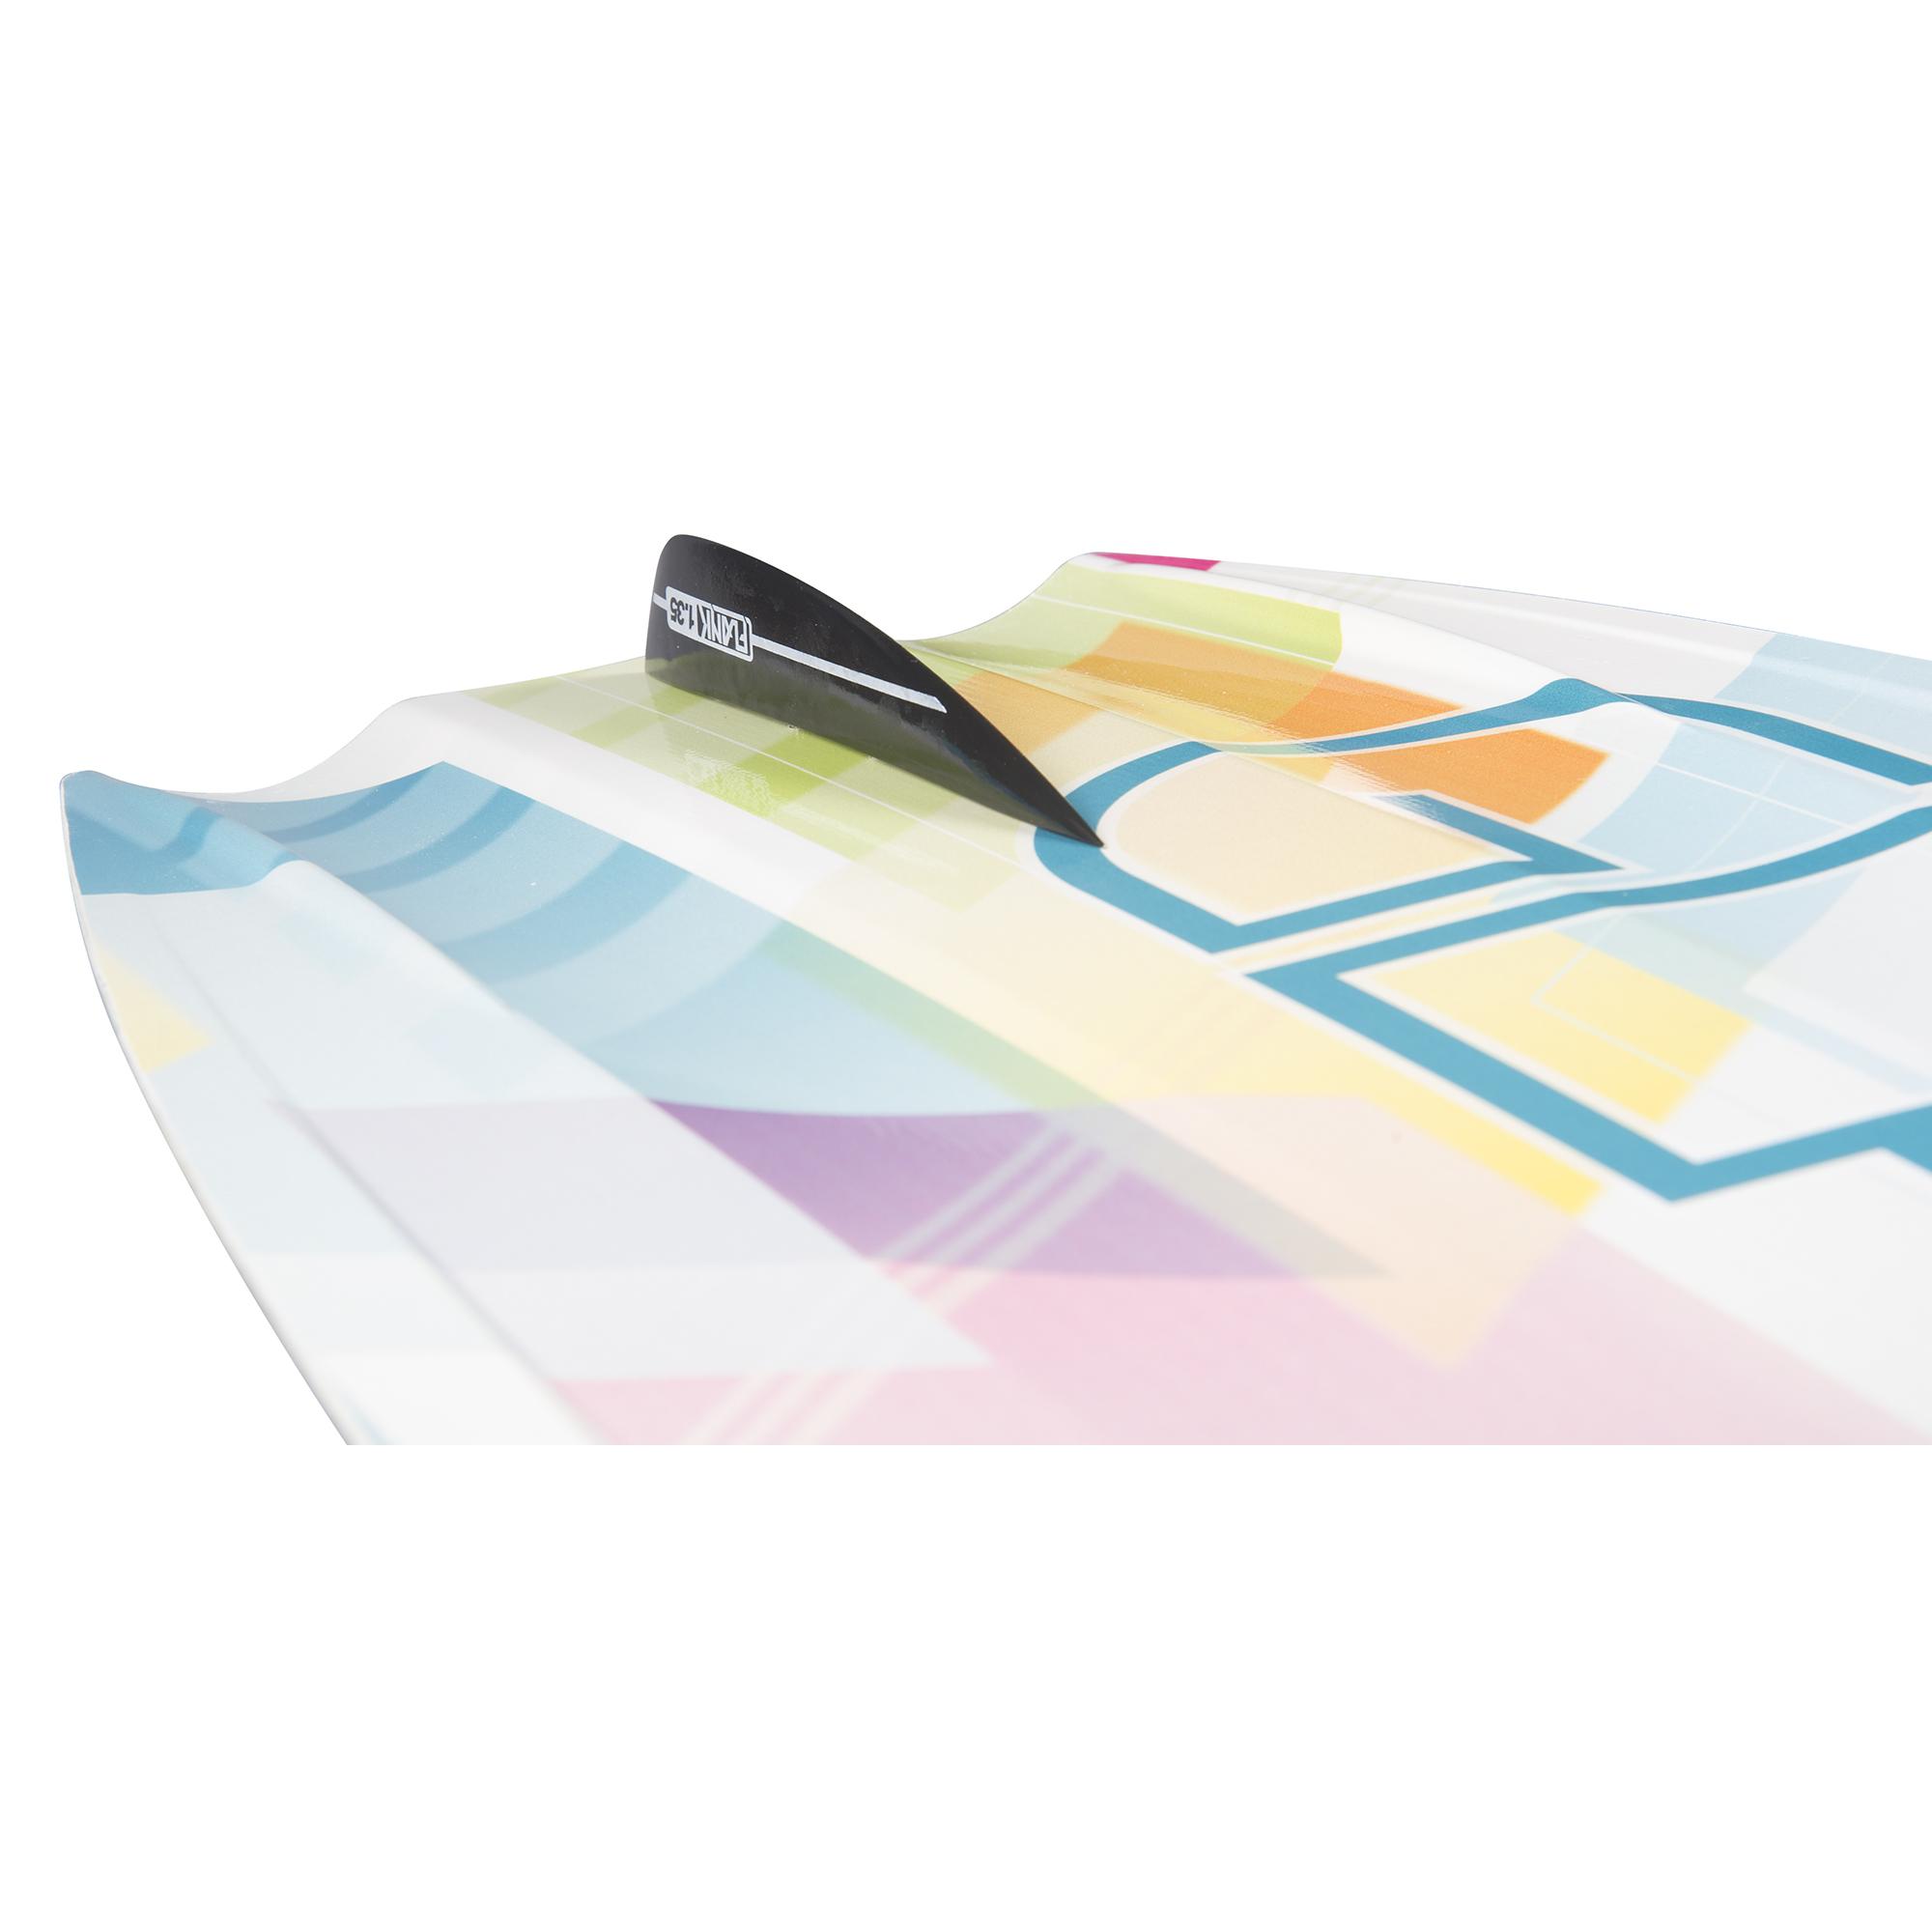 Gladiator Bliss Wakeboard Package w/Nova Bindings, Handle, And Static Line